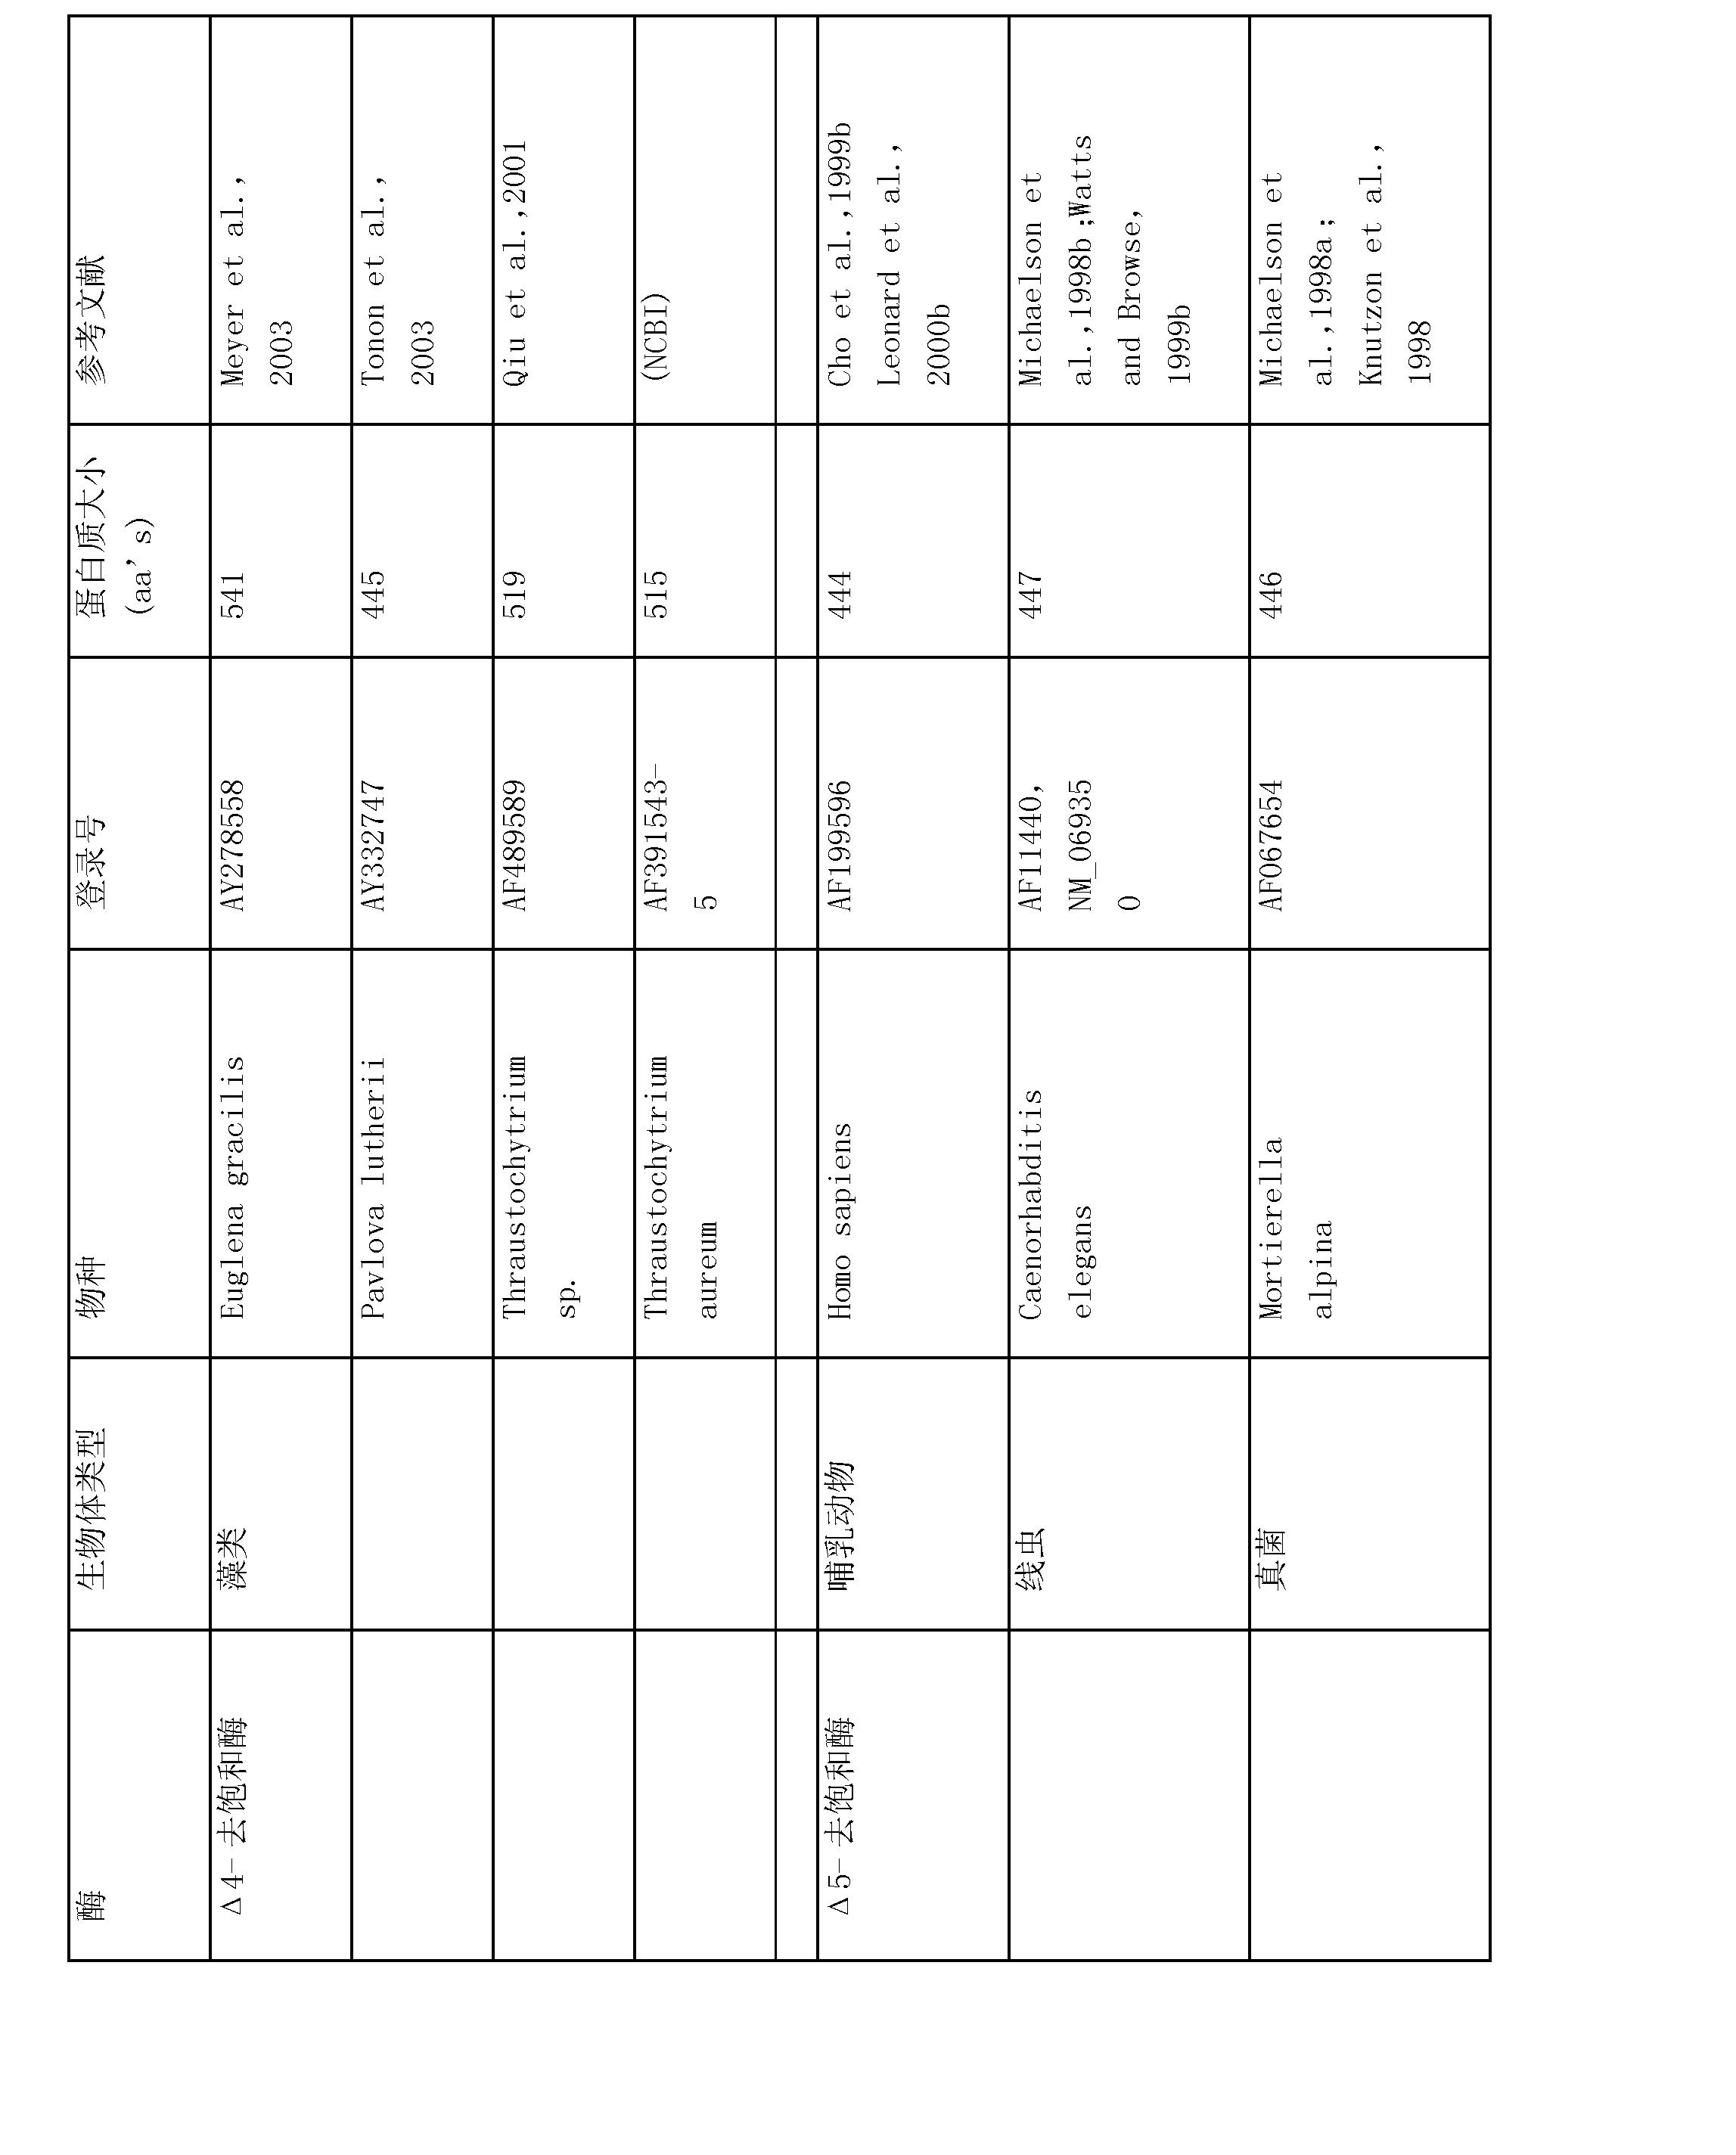 cytochrome b5-like heme/steroid binding domain